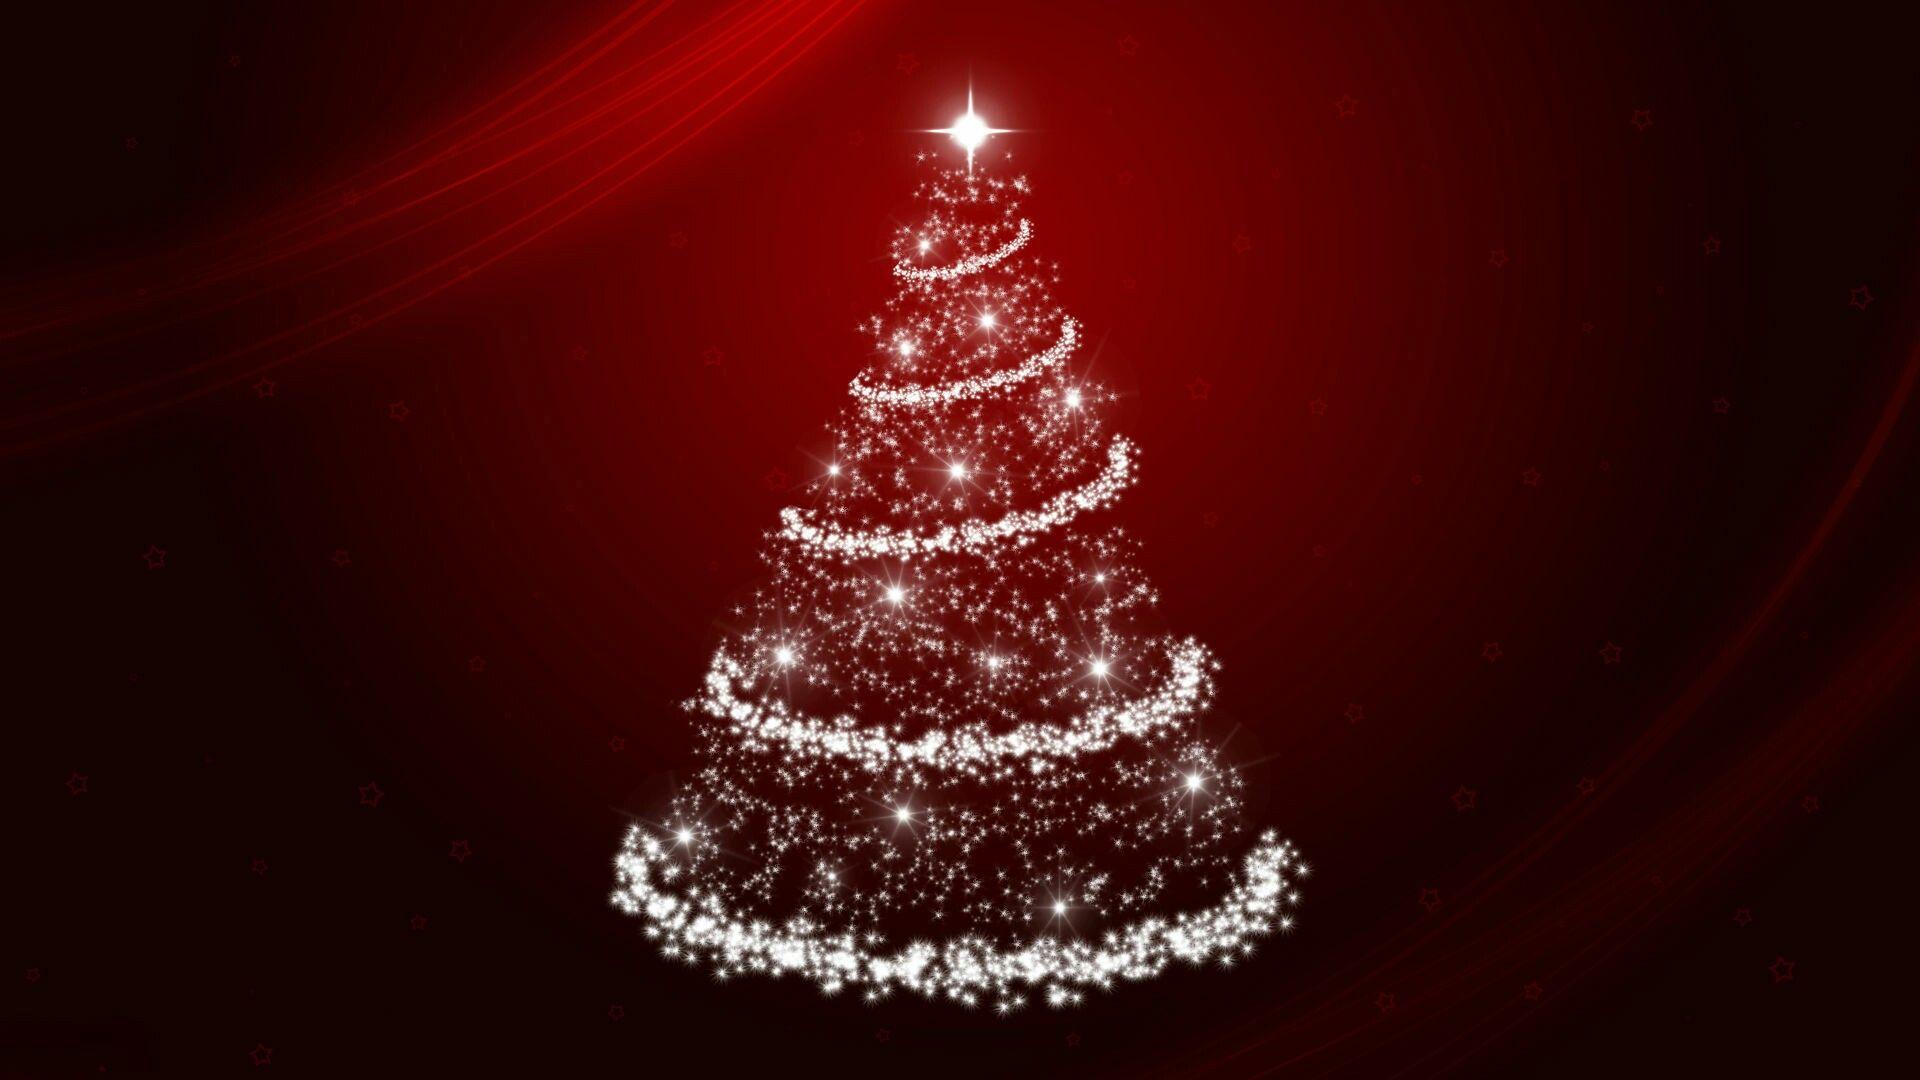 Pin by Beverly Benkart on Holidays, Birthdays & Special Days ...